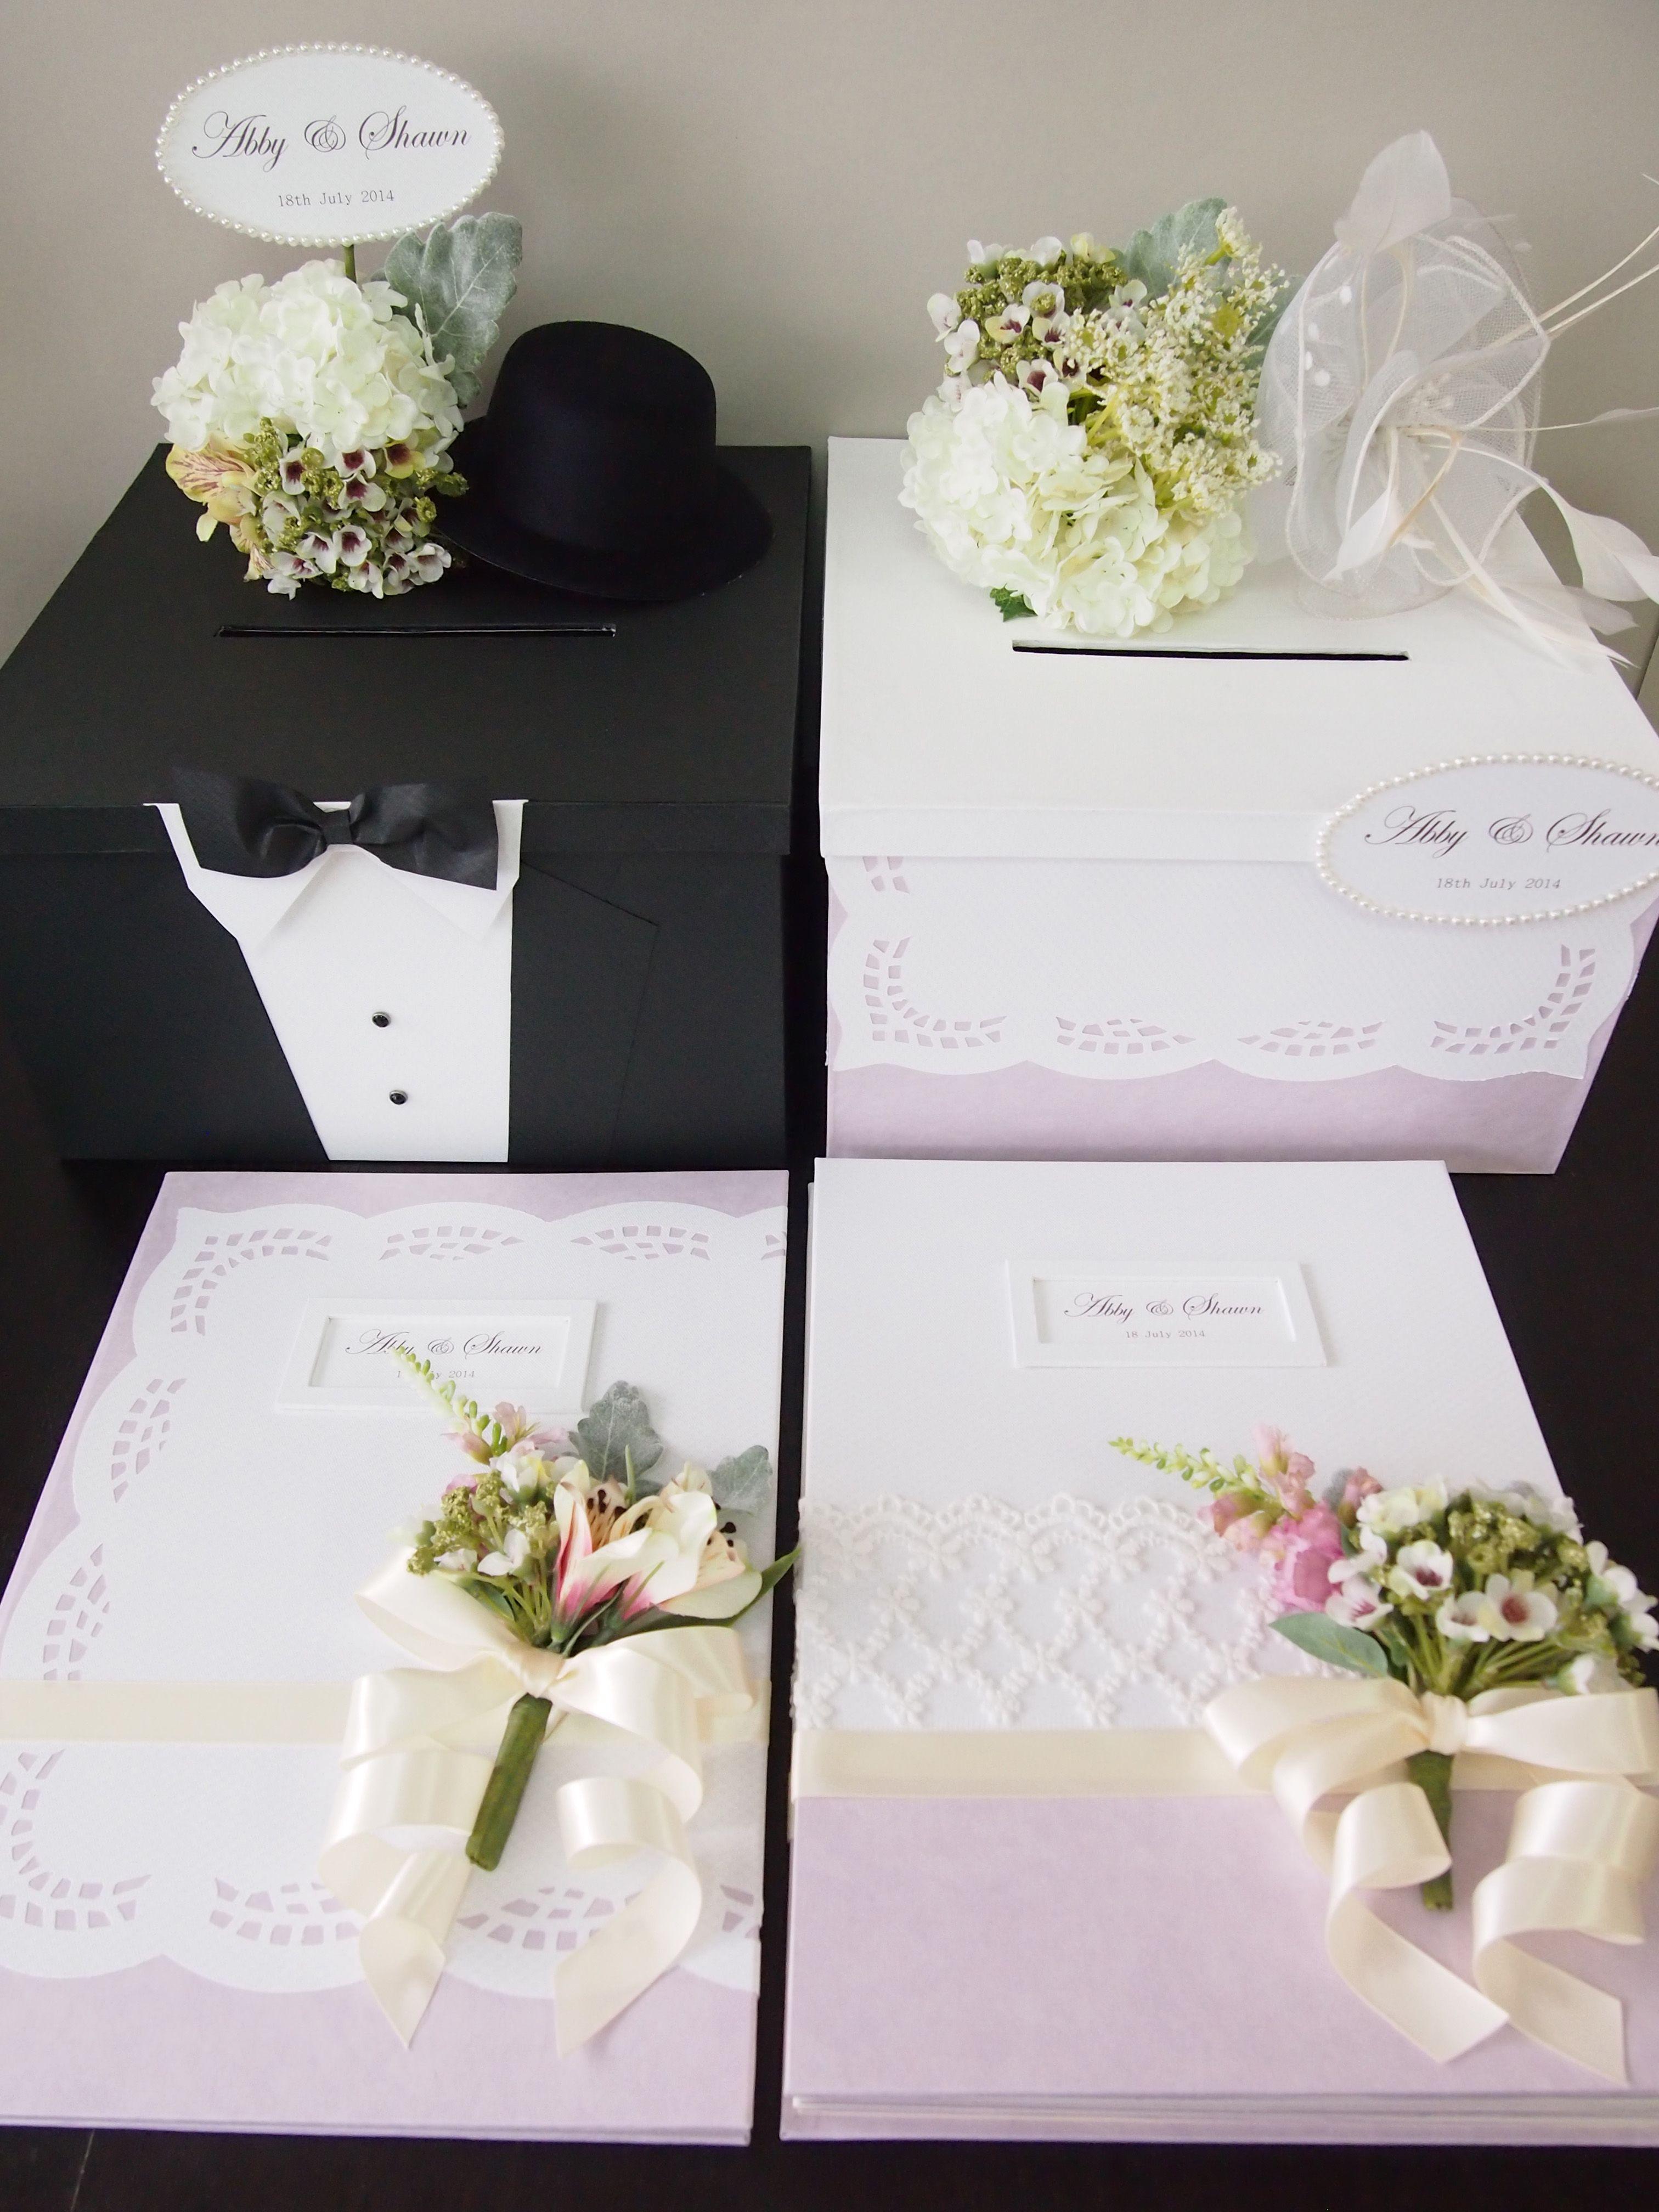 pegeo wedding set  money  gift cards box set for bride